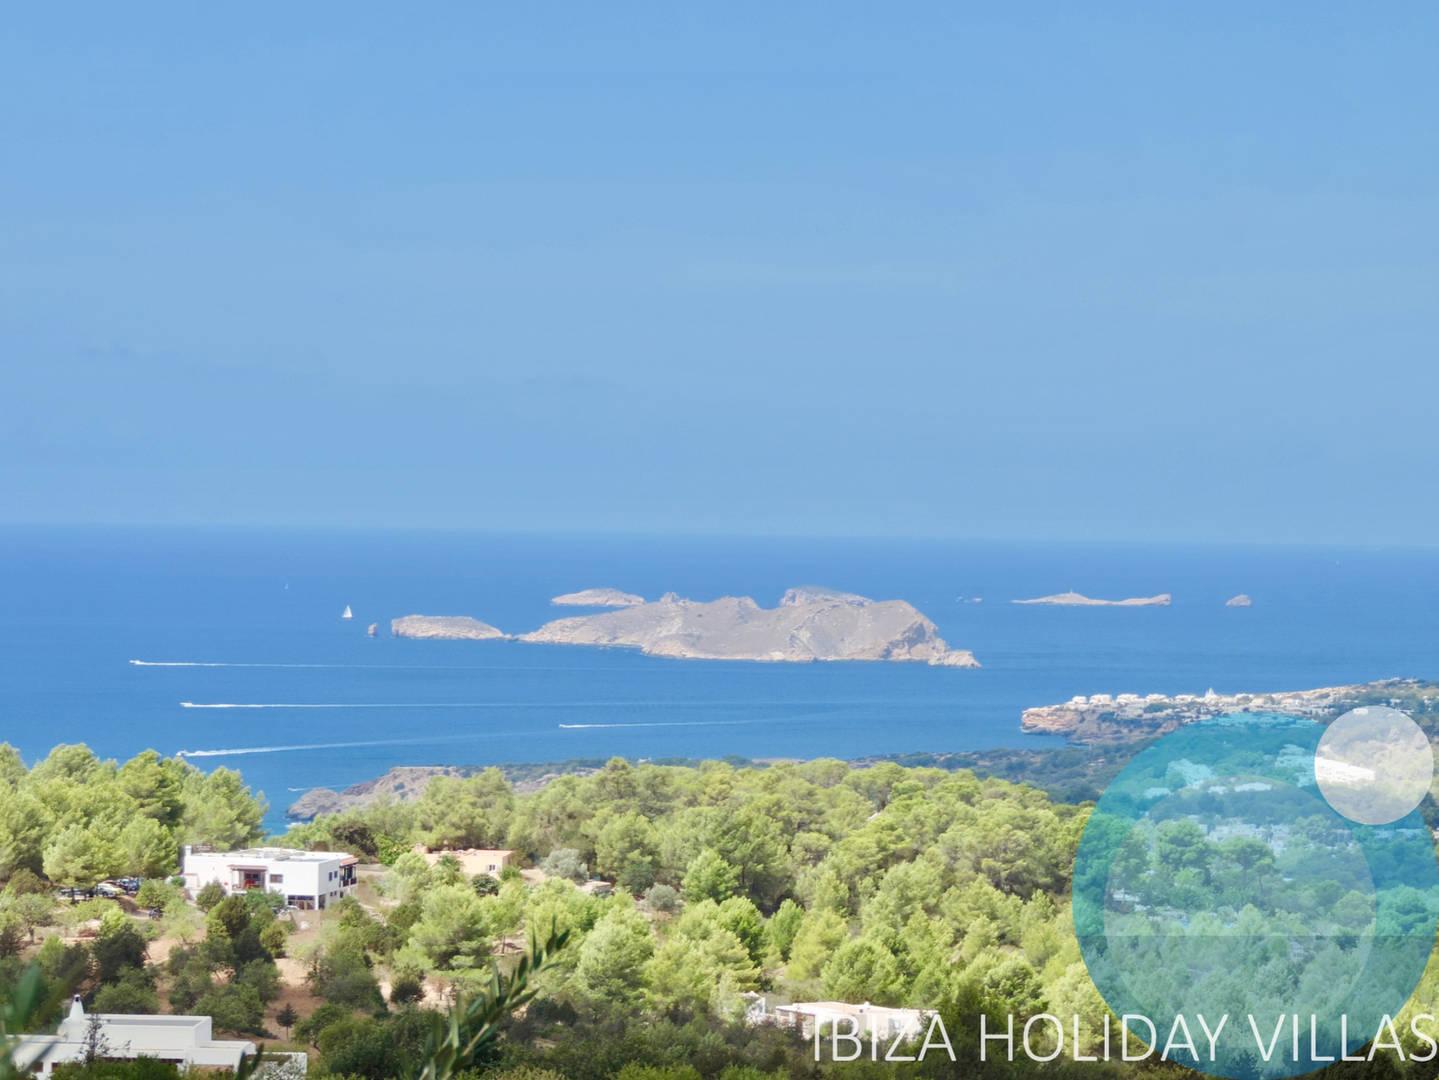 Jeronimo - Cala Tarida - Ibiza